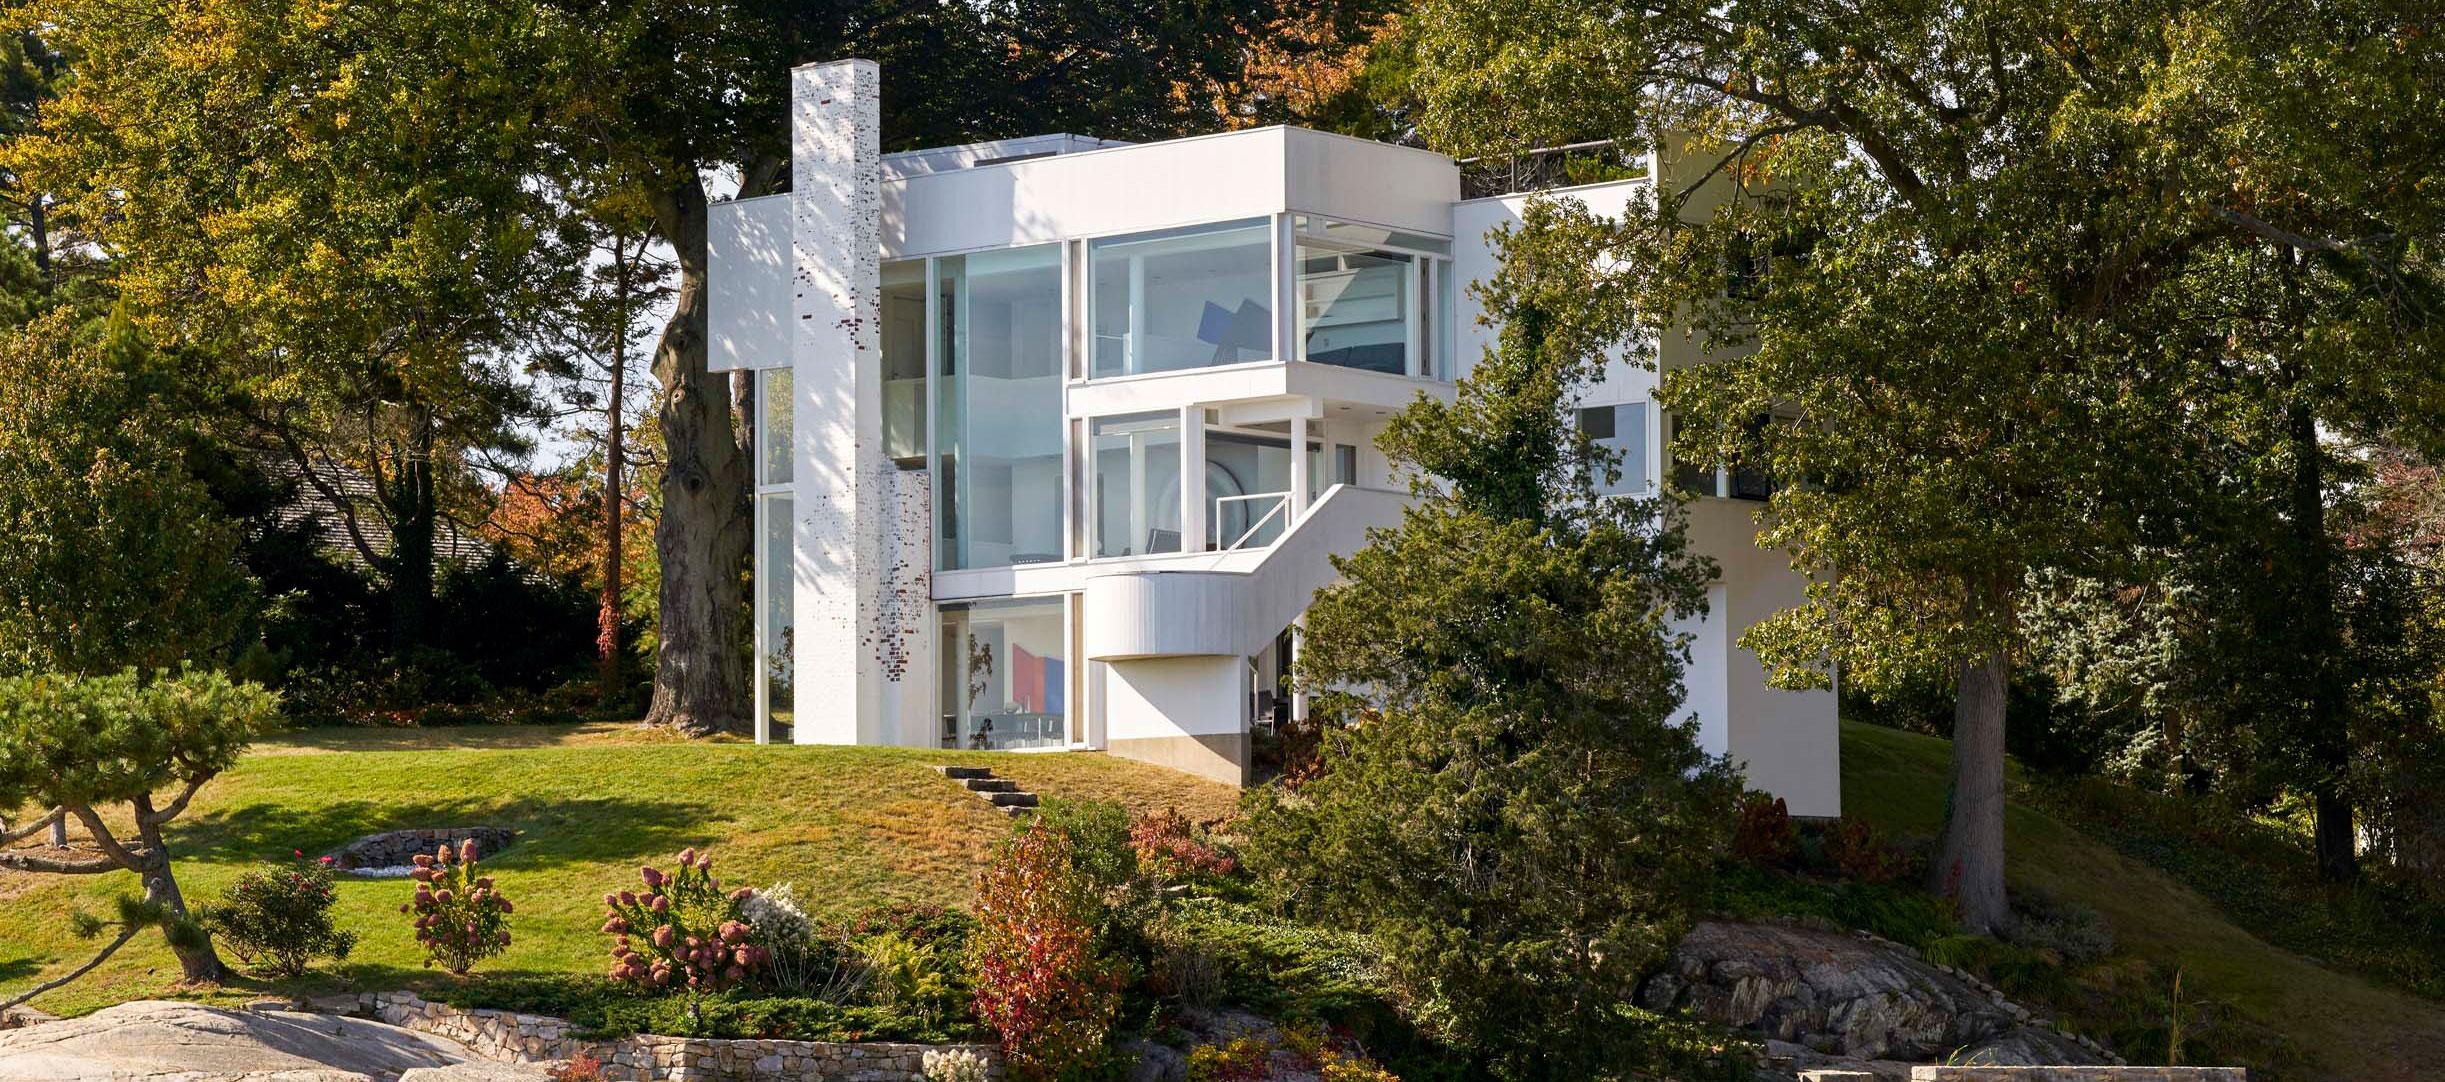 La Casa Smith por Richard Meier. Fotografía © Mike Schwartz. Imagen cortesía de Richard Meier & Partners Architects